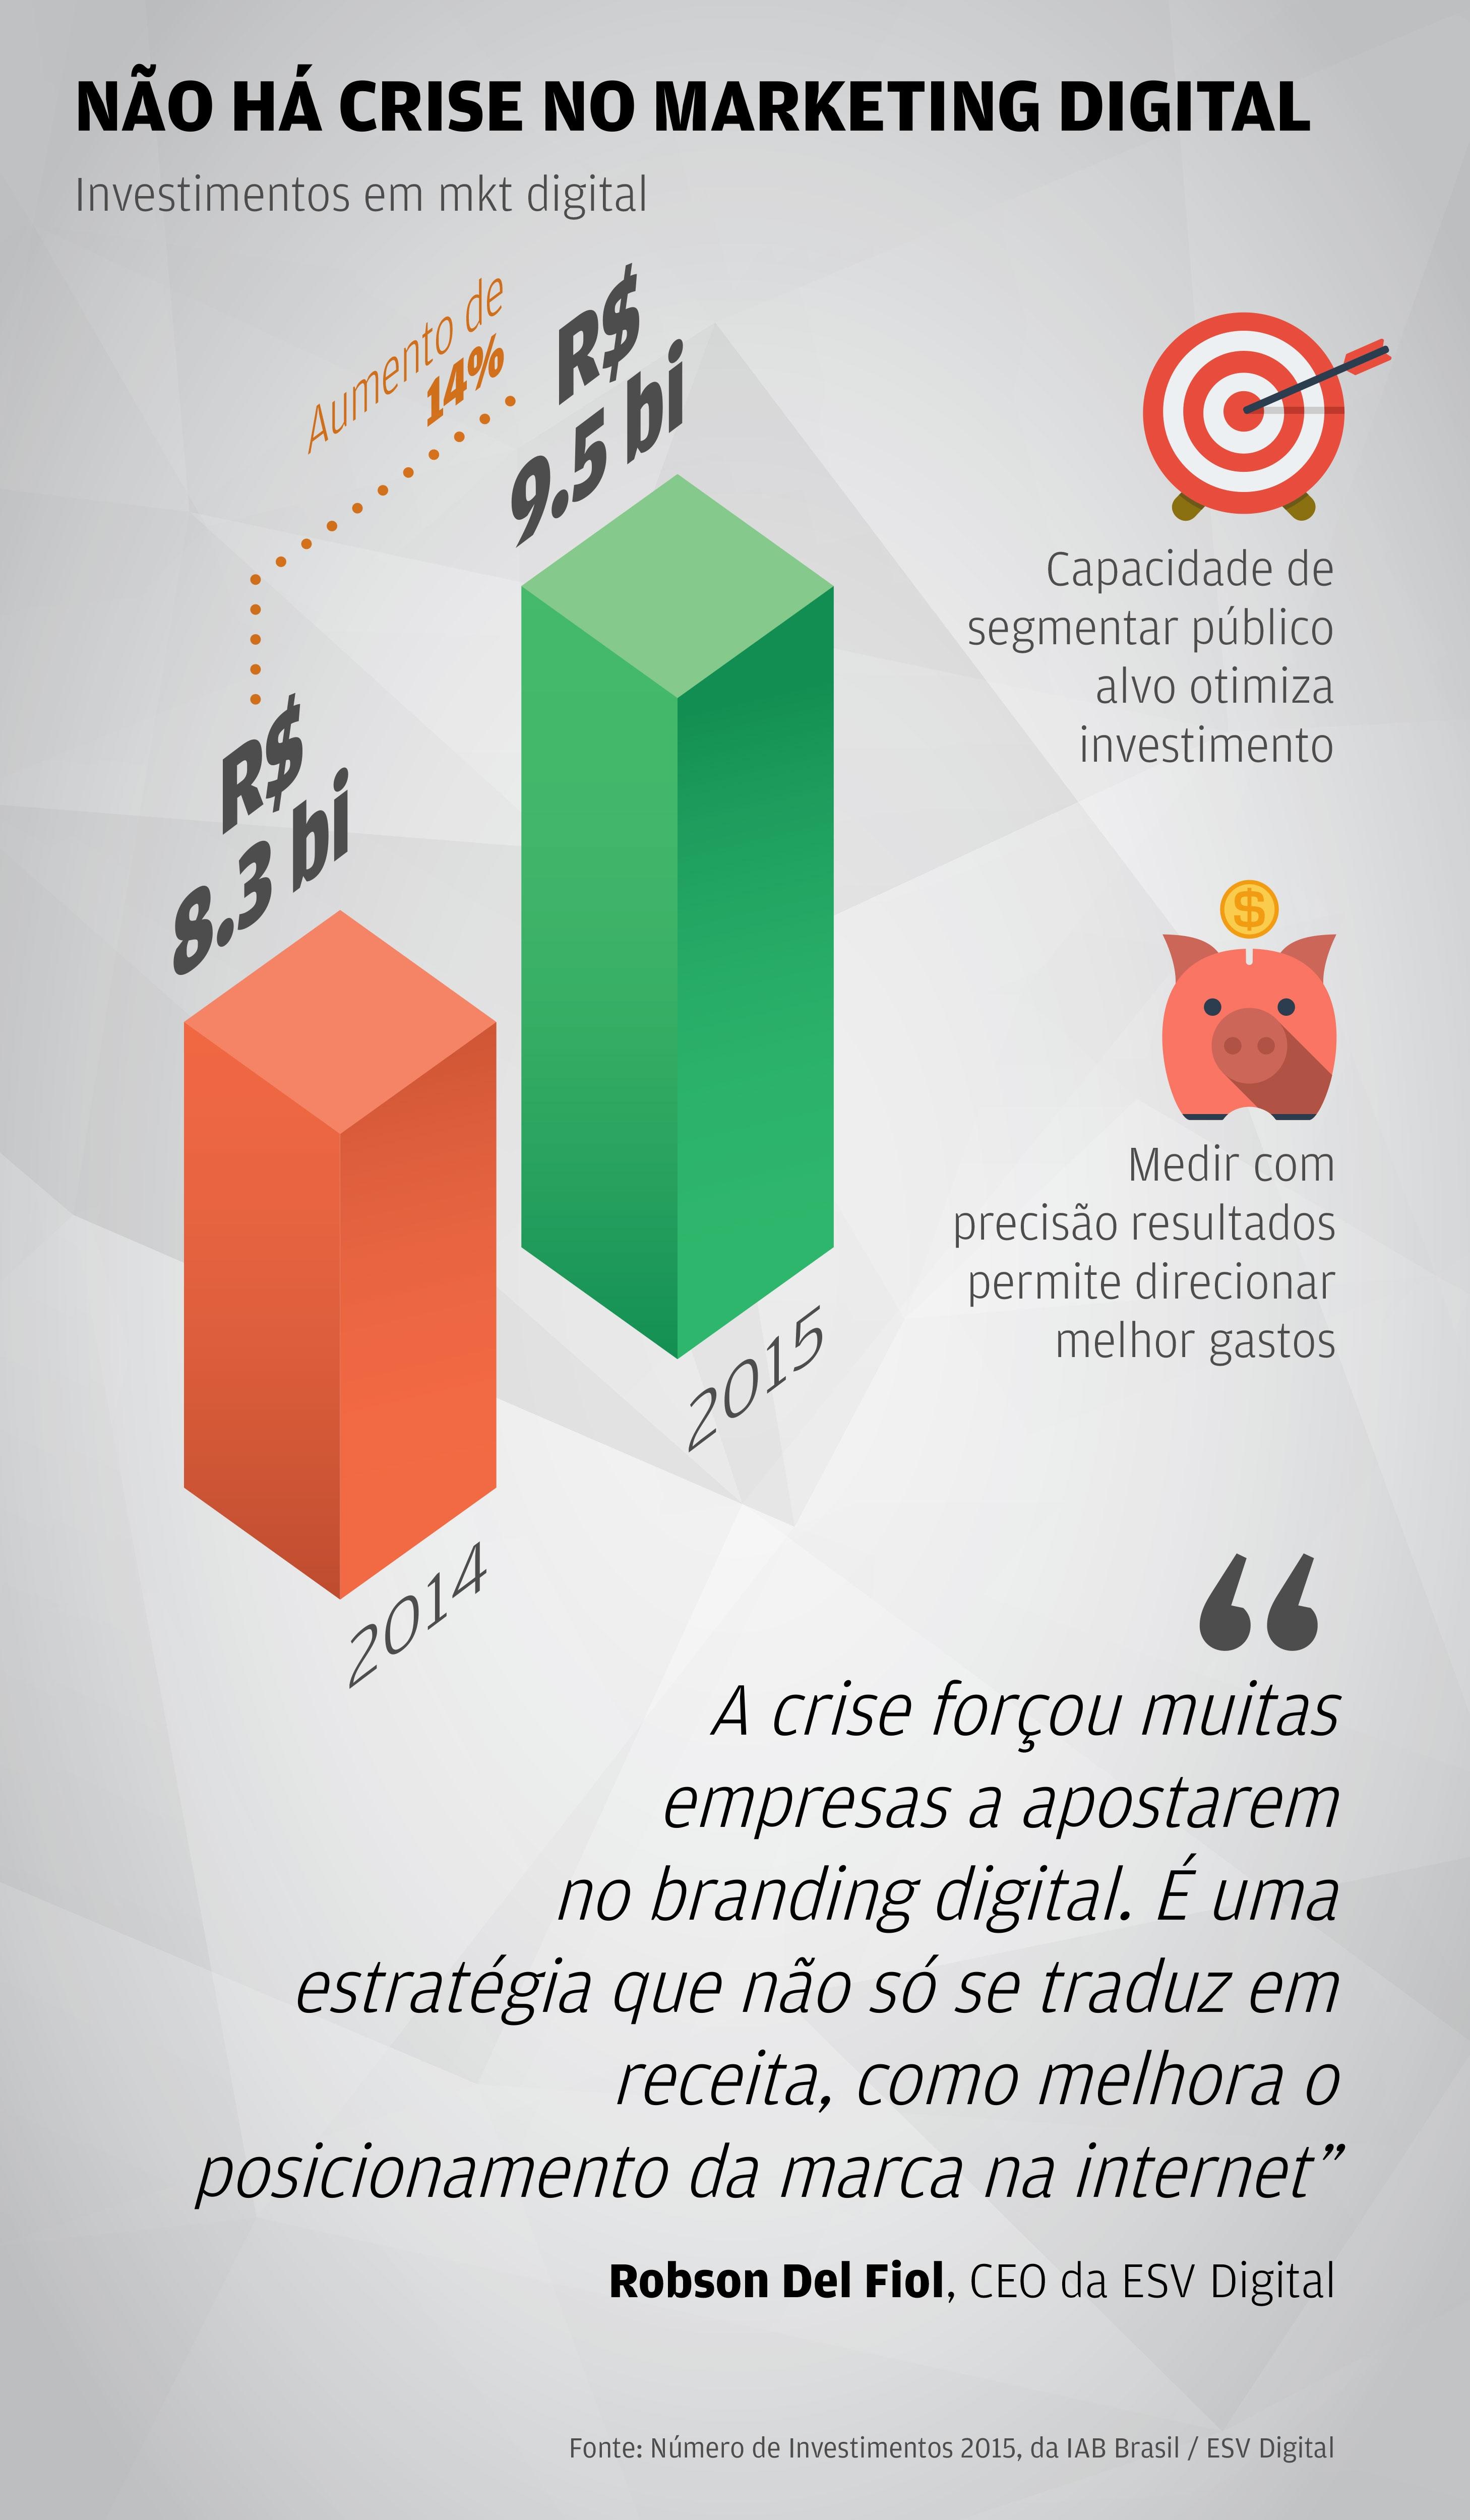 ESV Digital